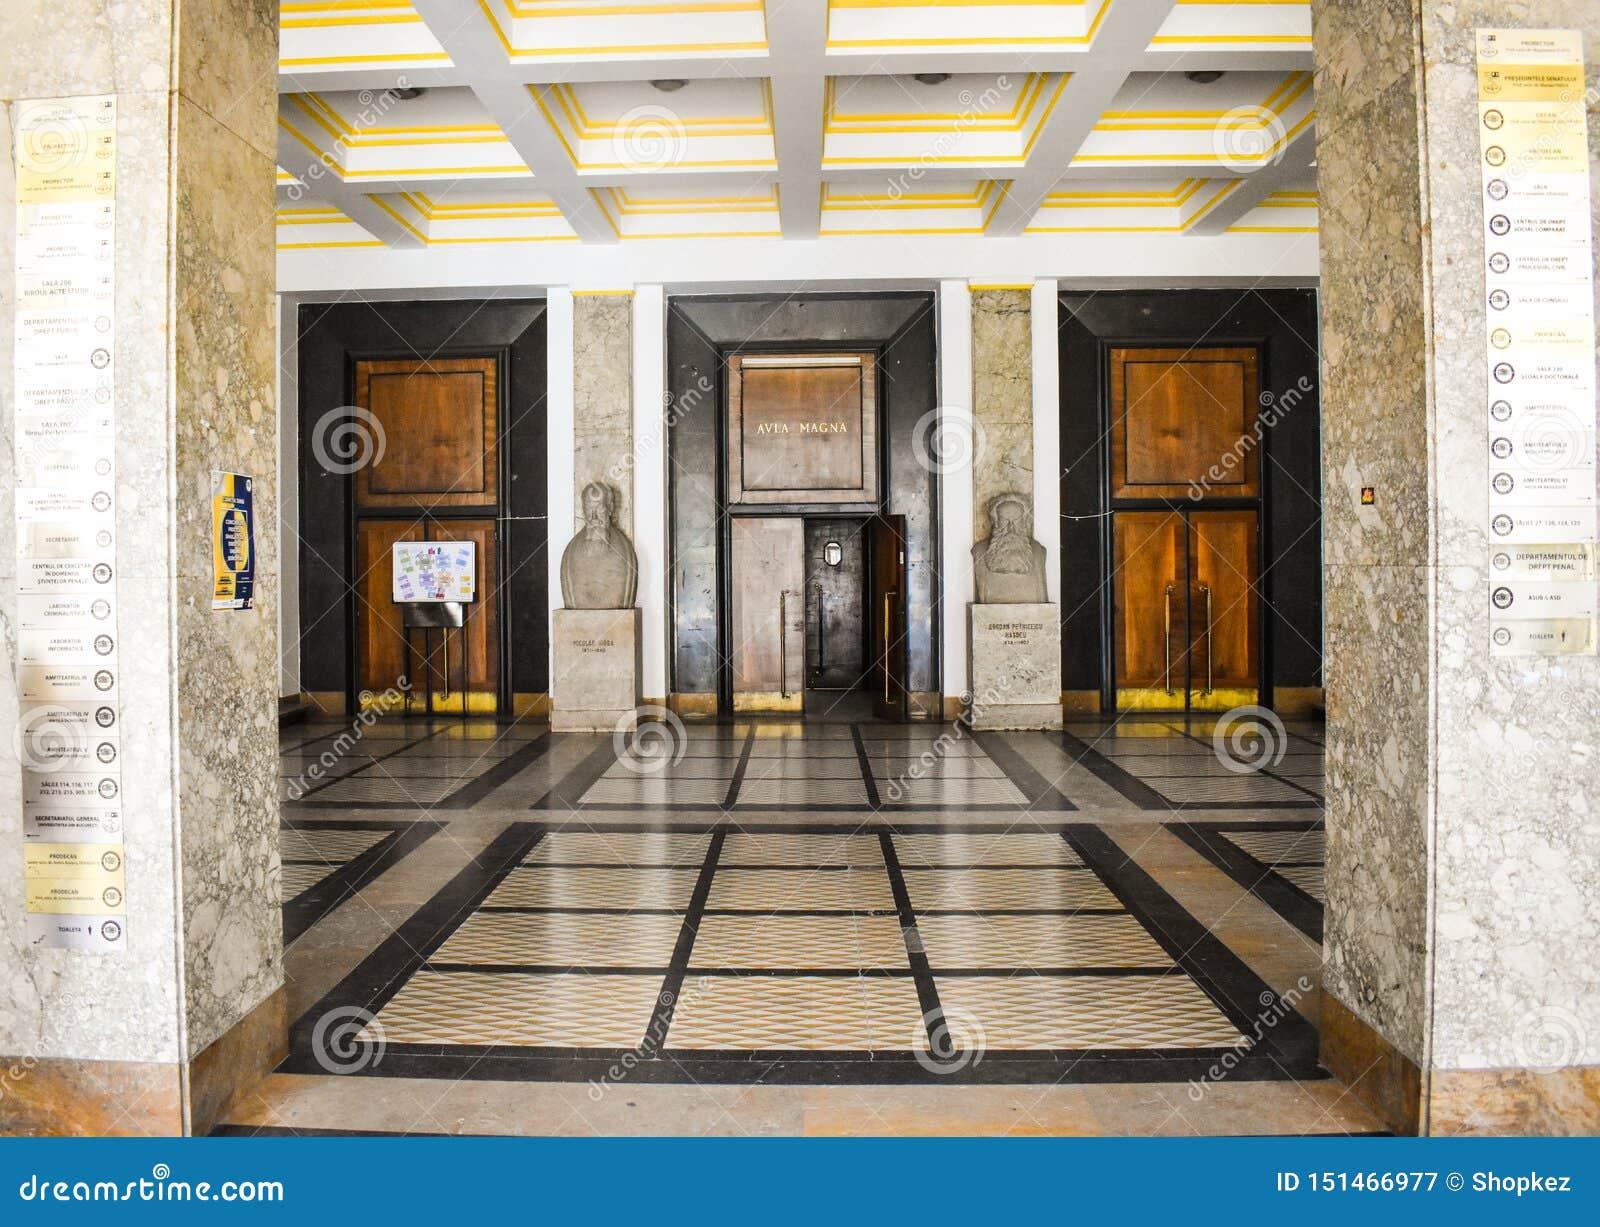 University of Bucharest - Law School building - Bucharest, Romania - 10.06.2019